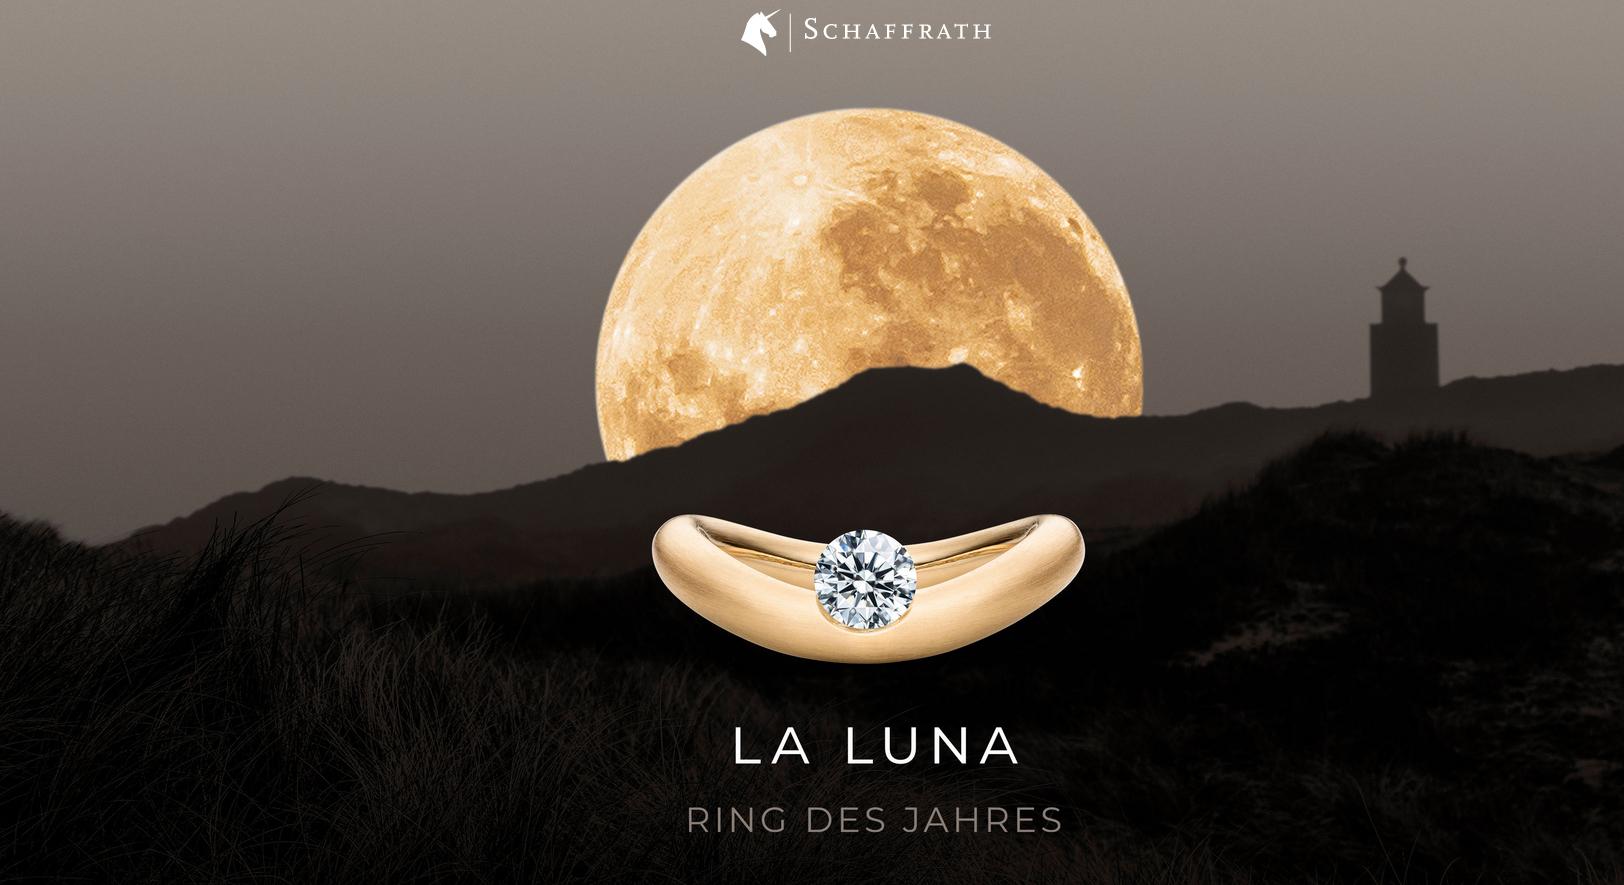 """LA Luna"" Schmuckstück des Jahres"